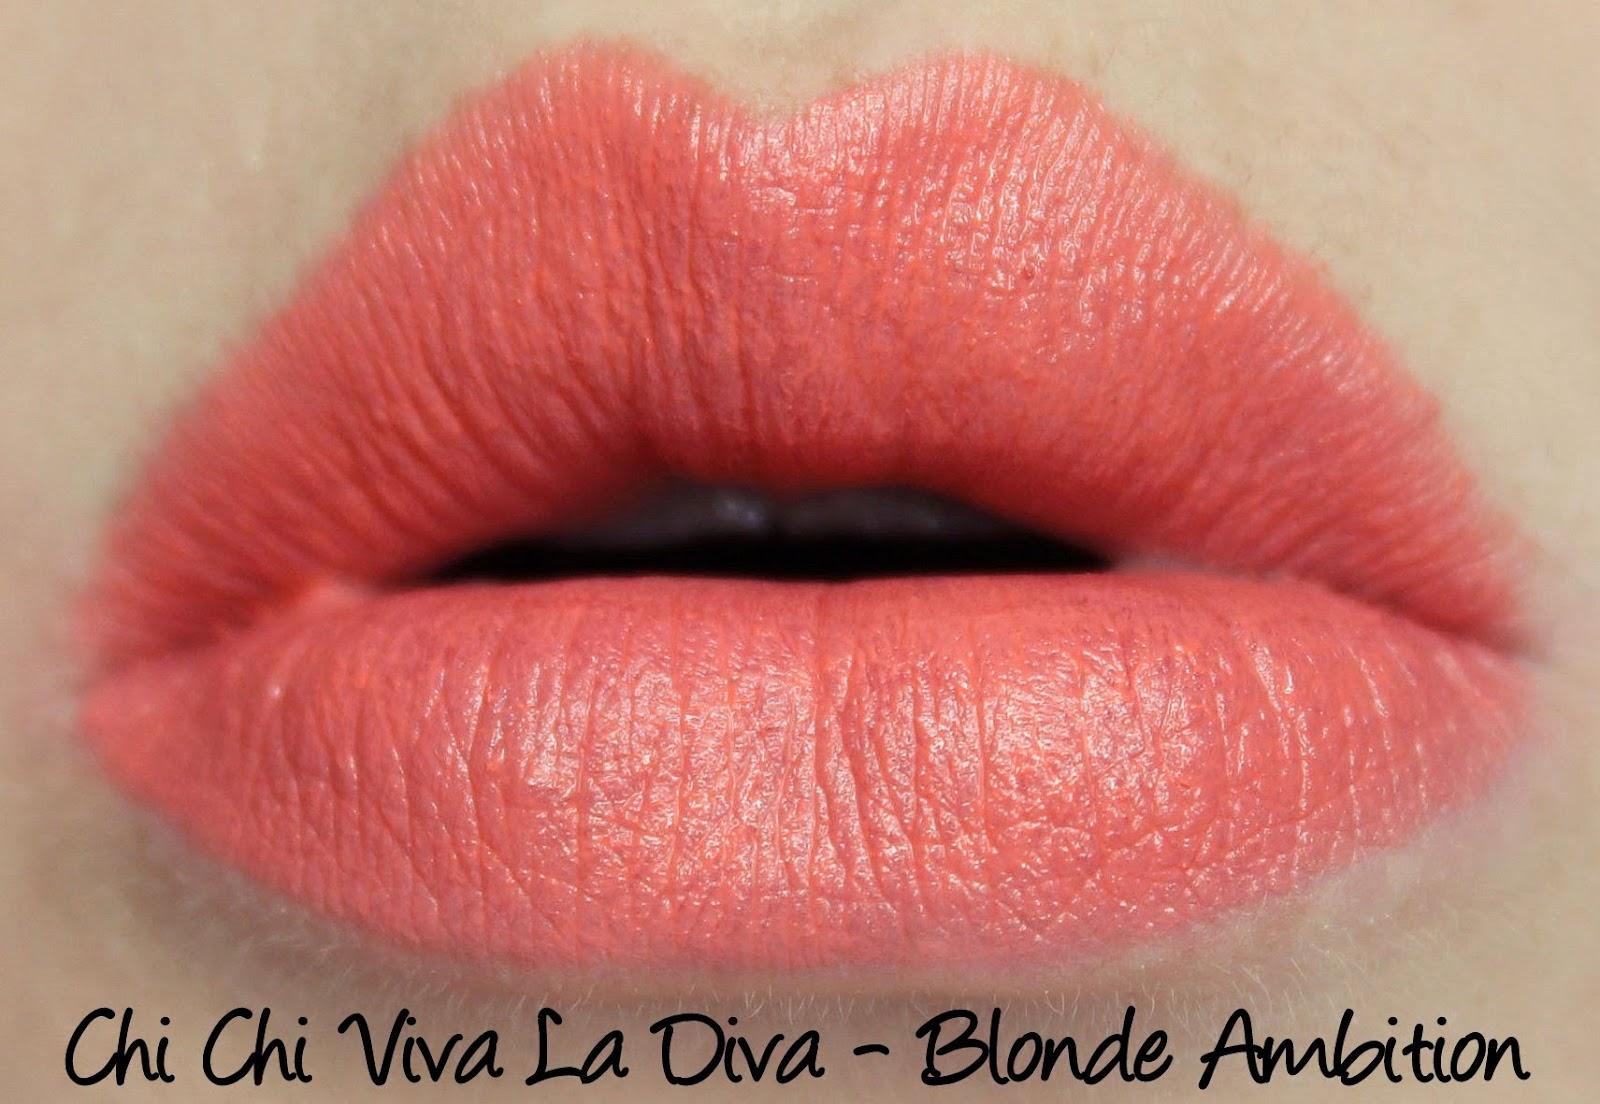 Chi Chi Viva La Diva Lipstick - Blonde Ambition Swatches & Review